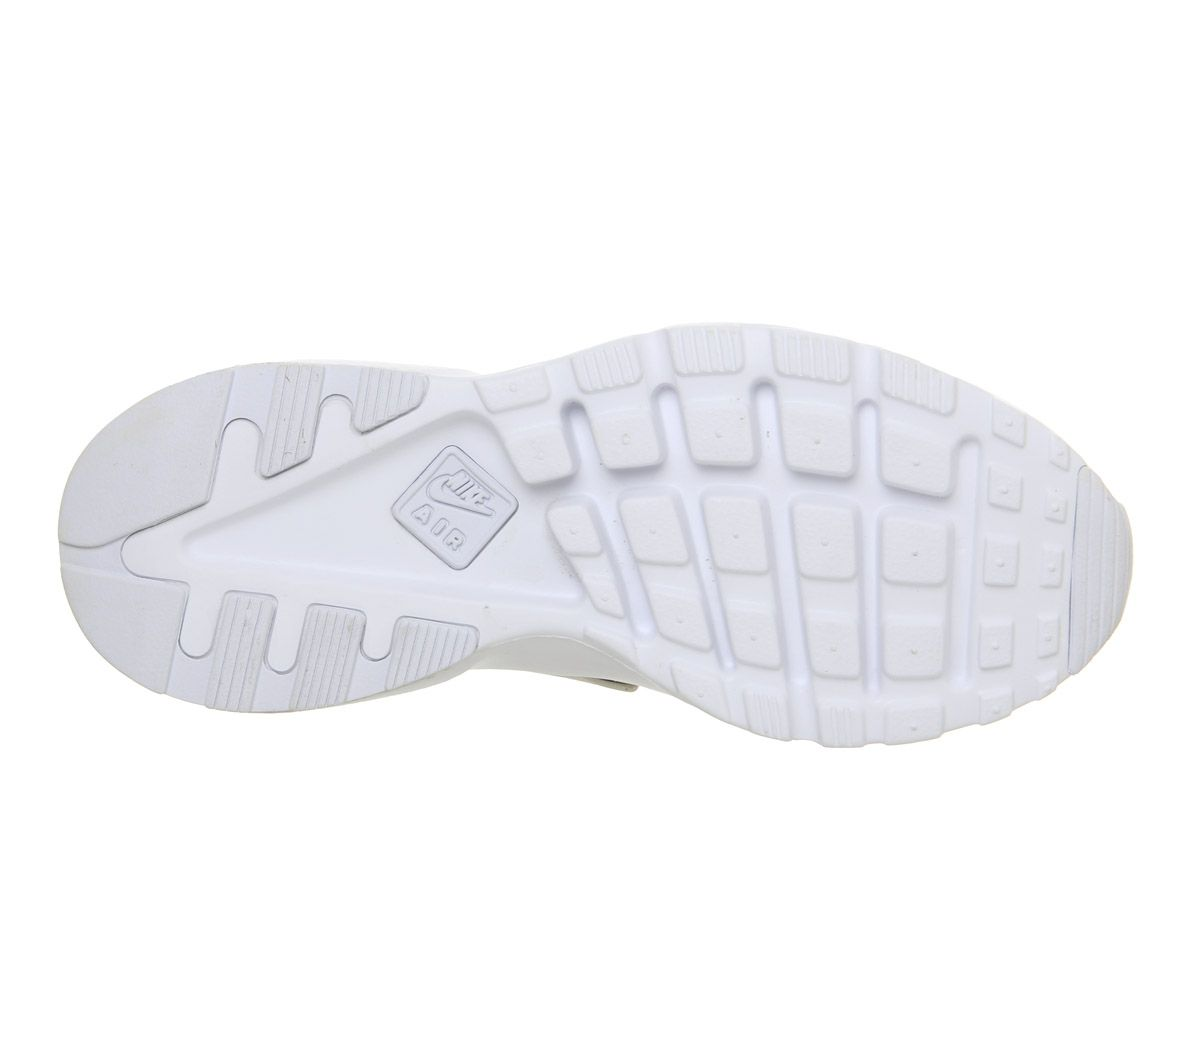 0344881271dd9 Nike Huarache Ultra GS Trainers Phantom Metallic Red Bronze White ...